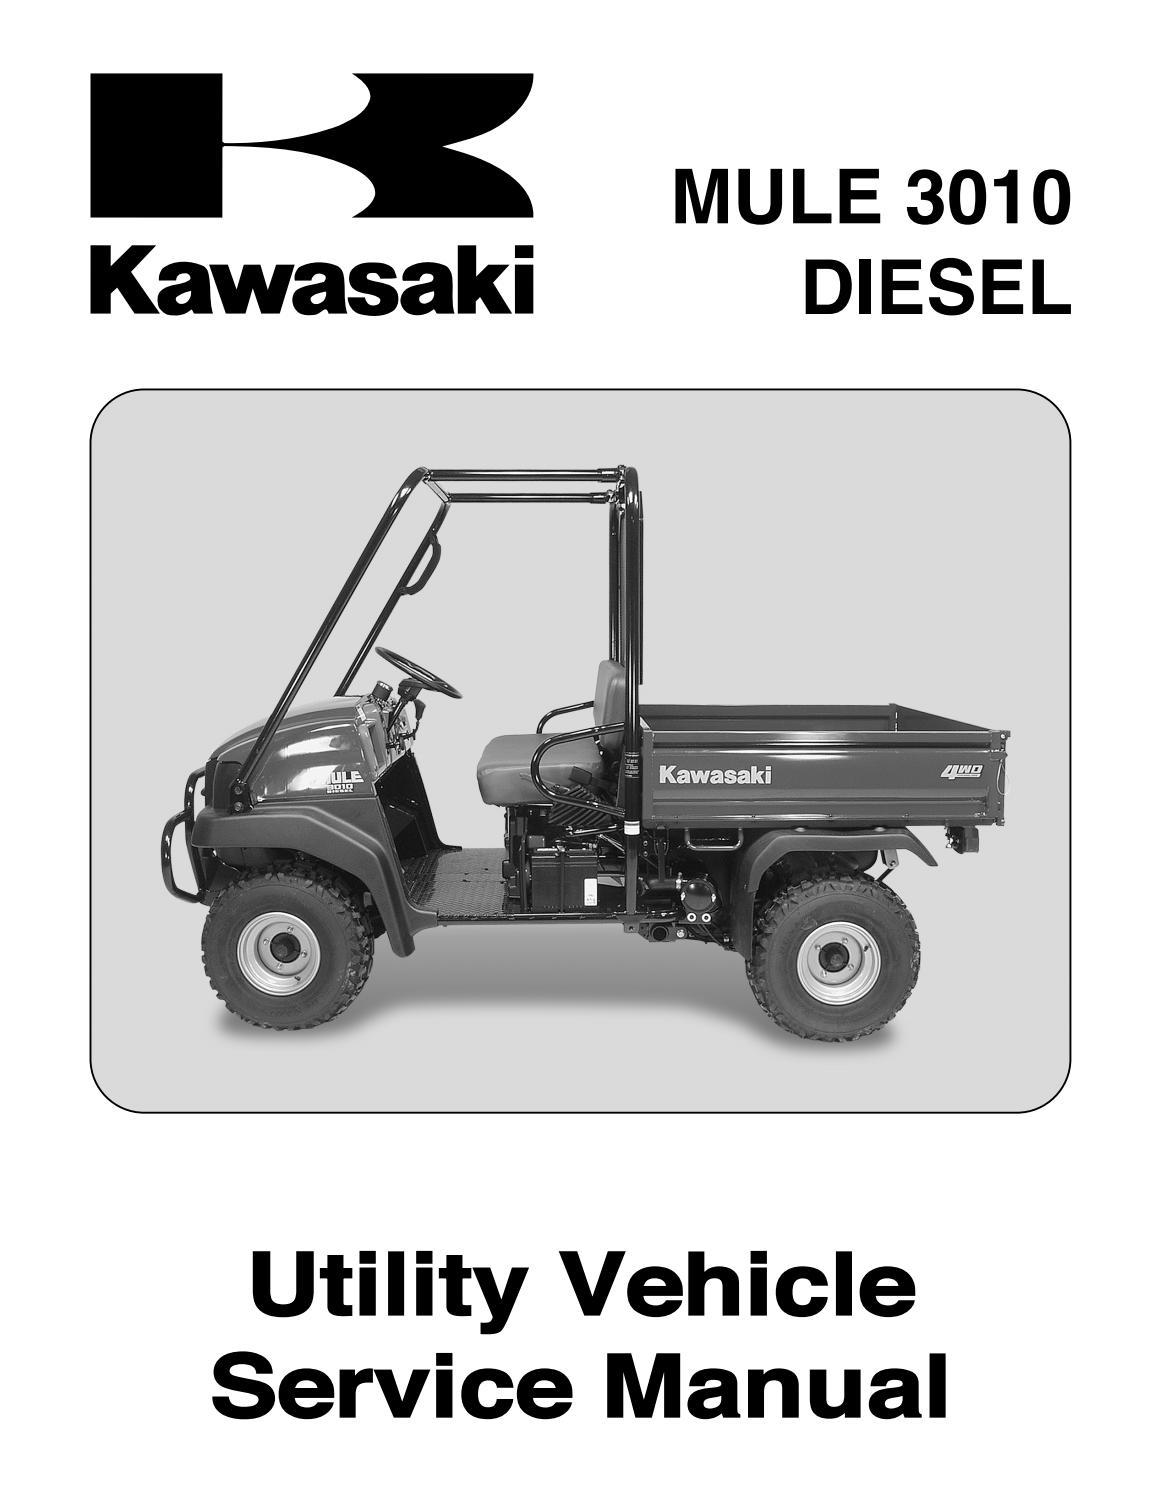 Kawasaki 3010 Gas Engine Diagram Wiring Diagram Return Foot Return Foot Zaafran It